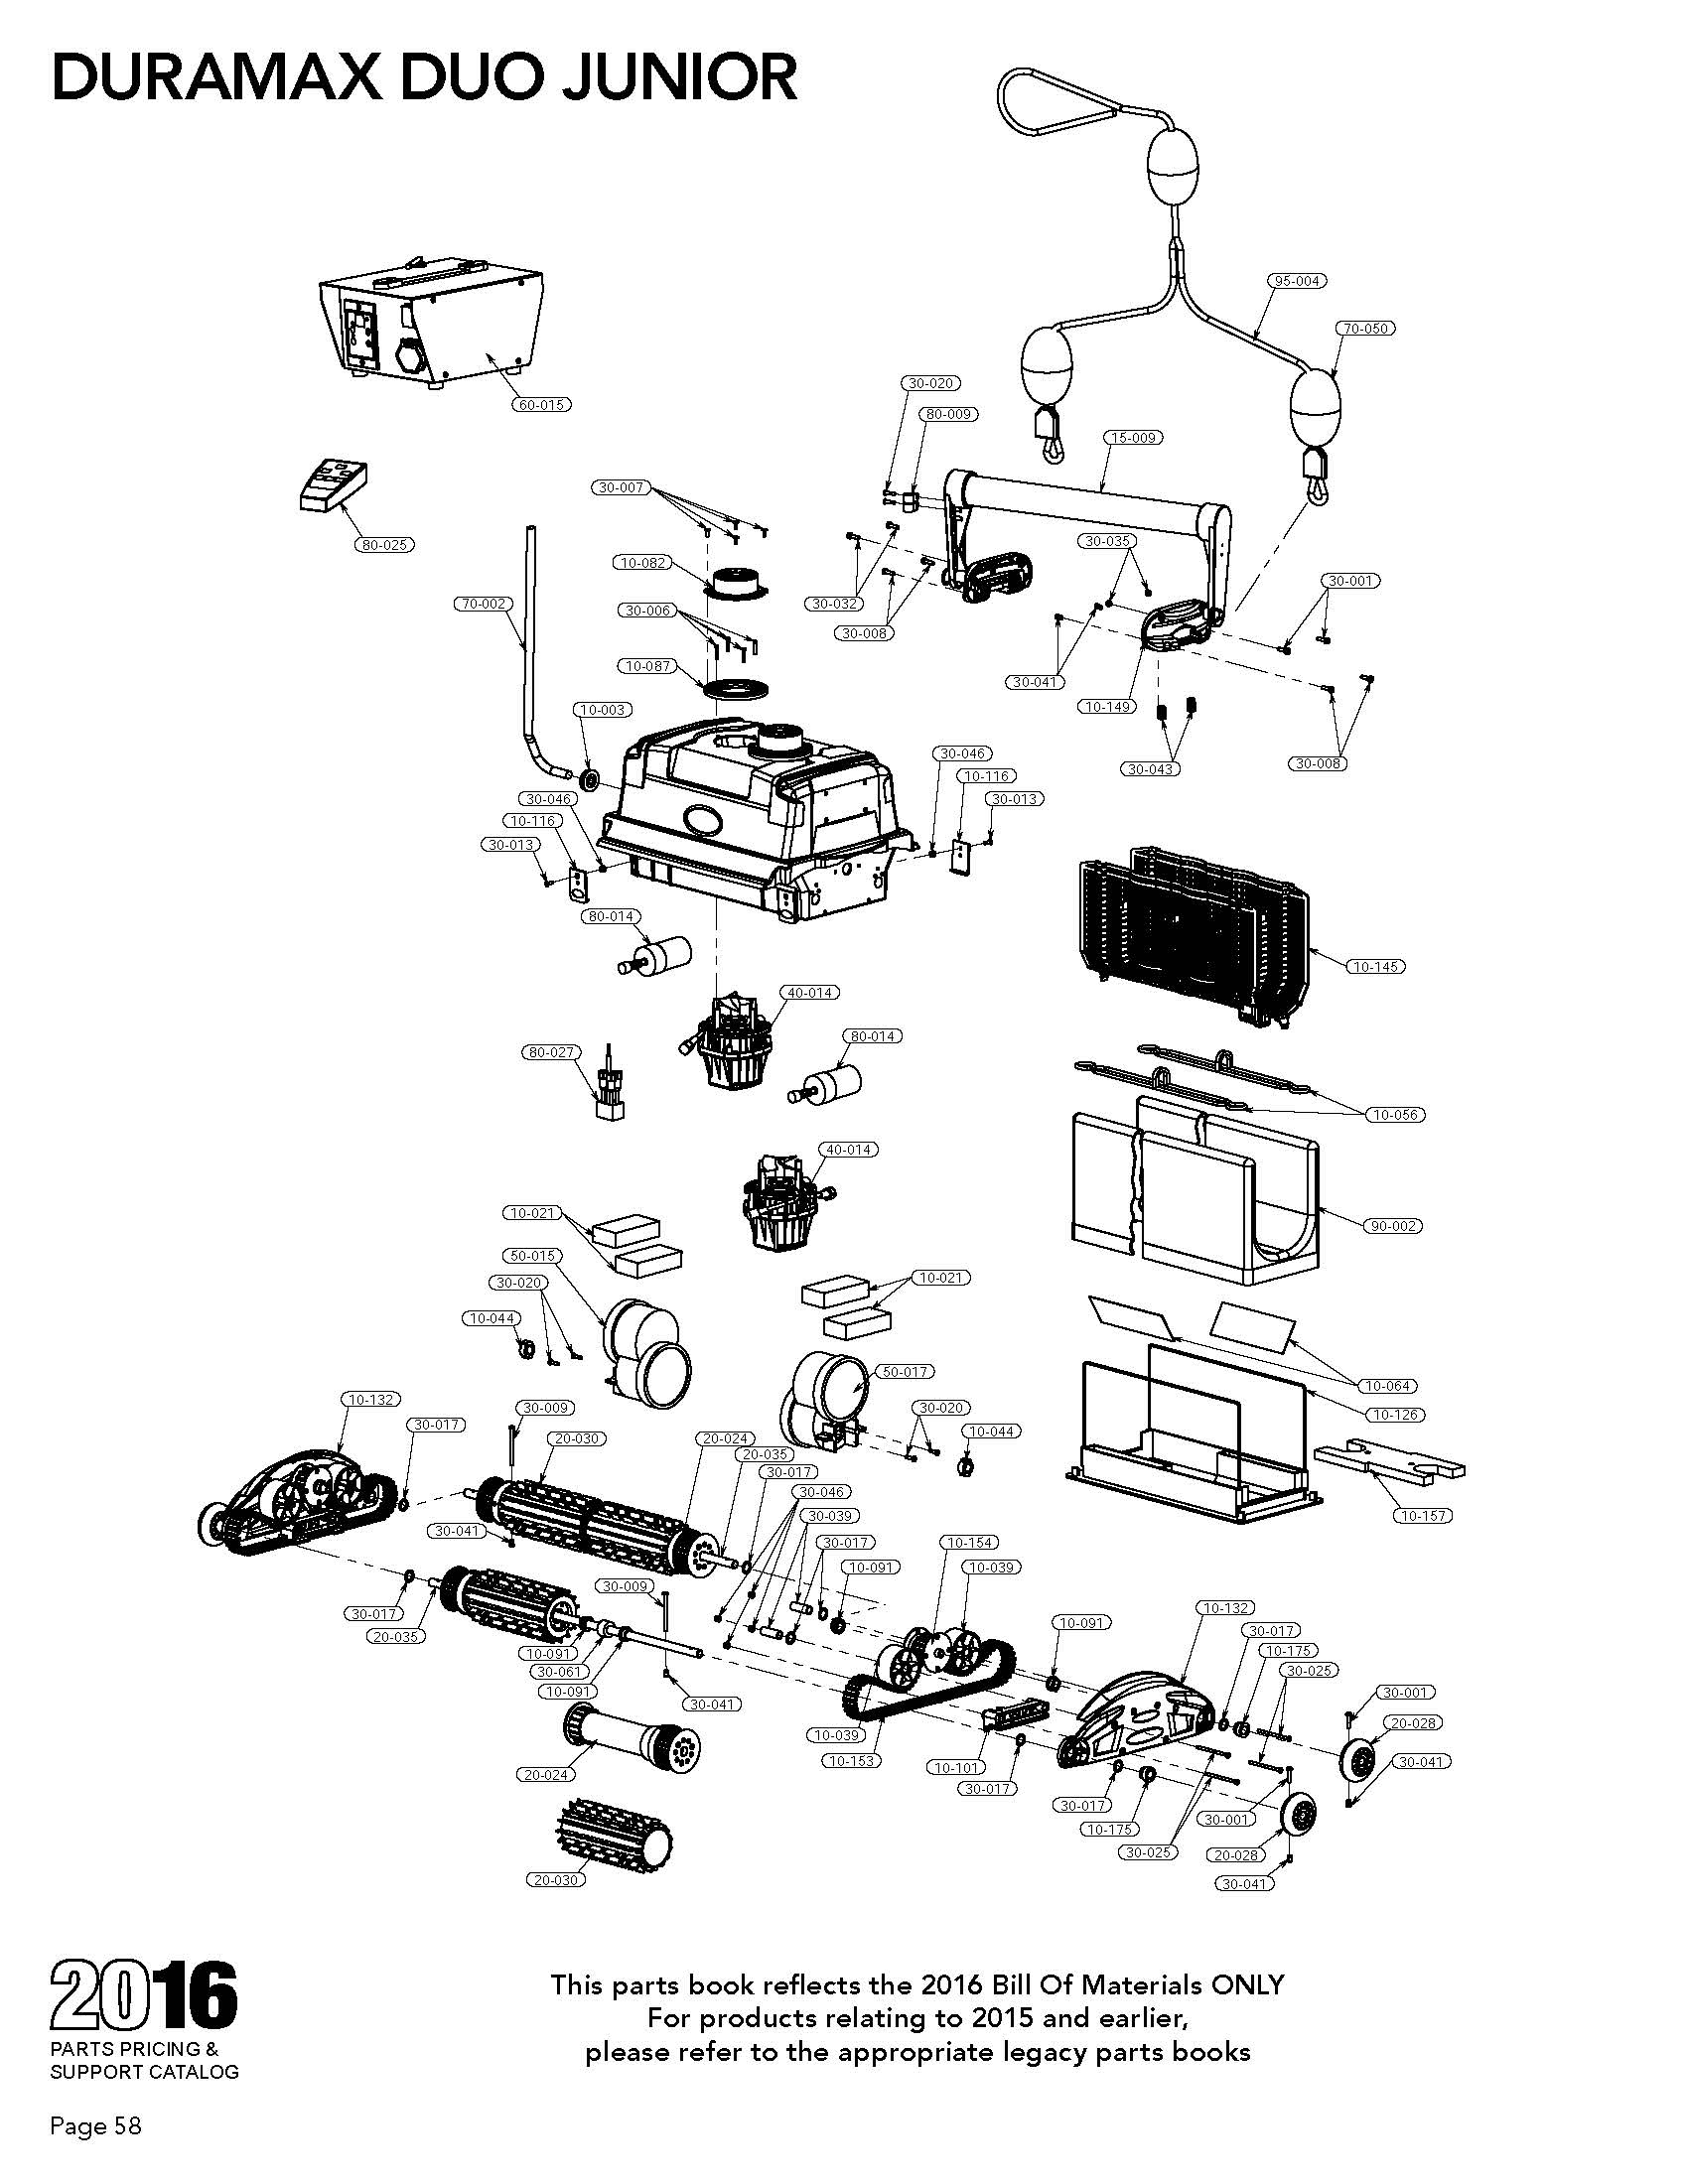 Duramax Duo Jr Parts Diagram And Parts List